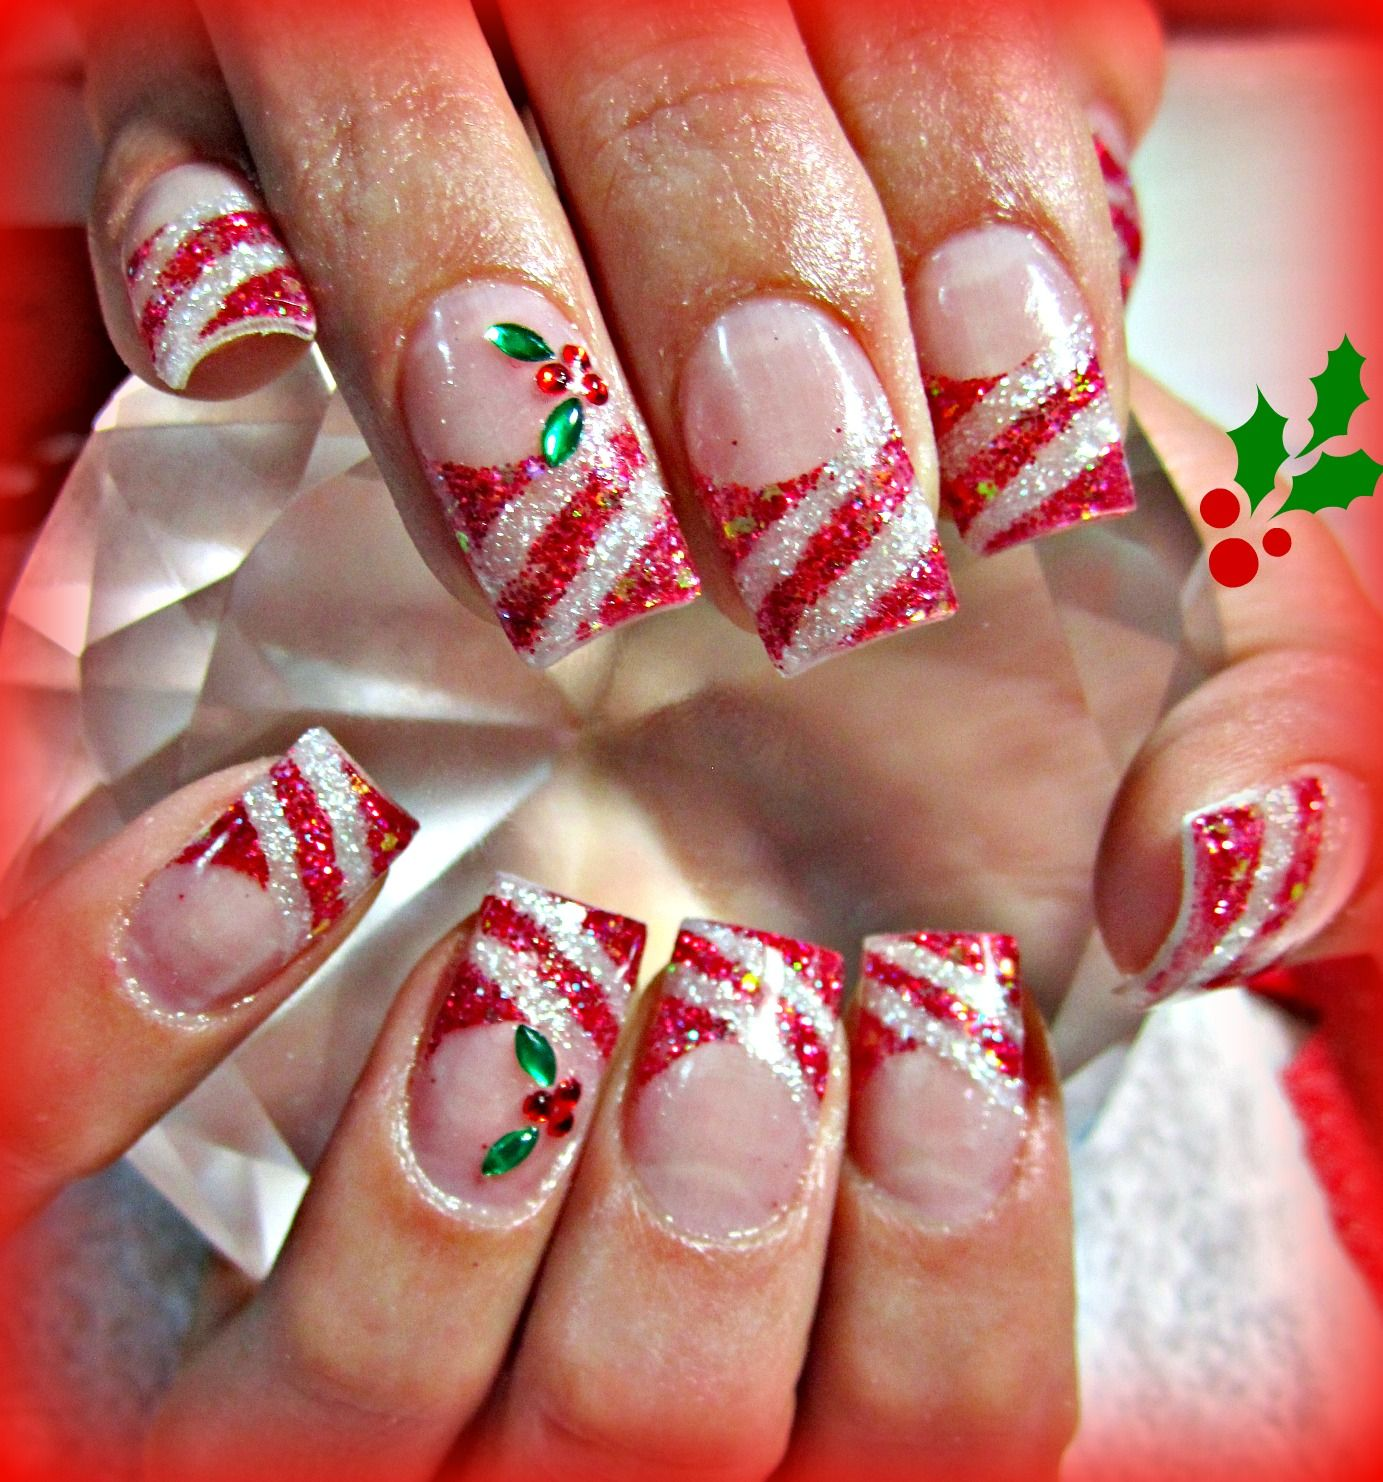 Candy Cane And Holly Acrylic Nails Xmas Nails Christmas Nail Designs Christmas Nail Art Designs